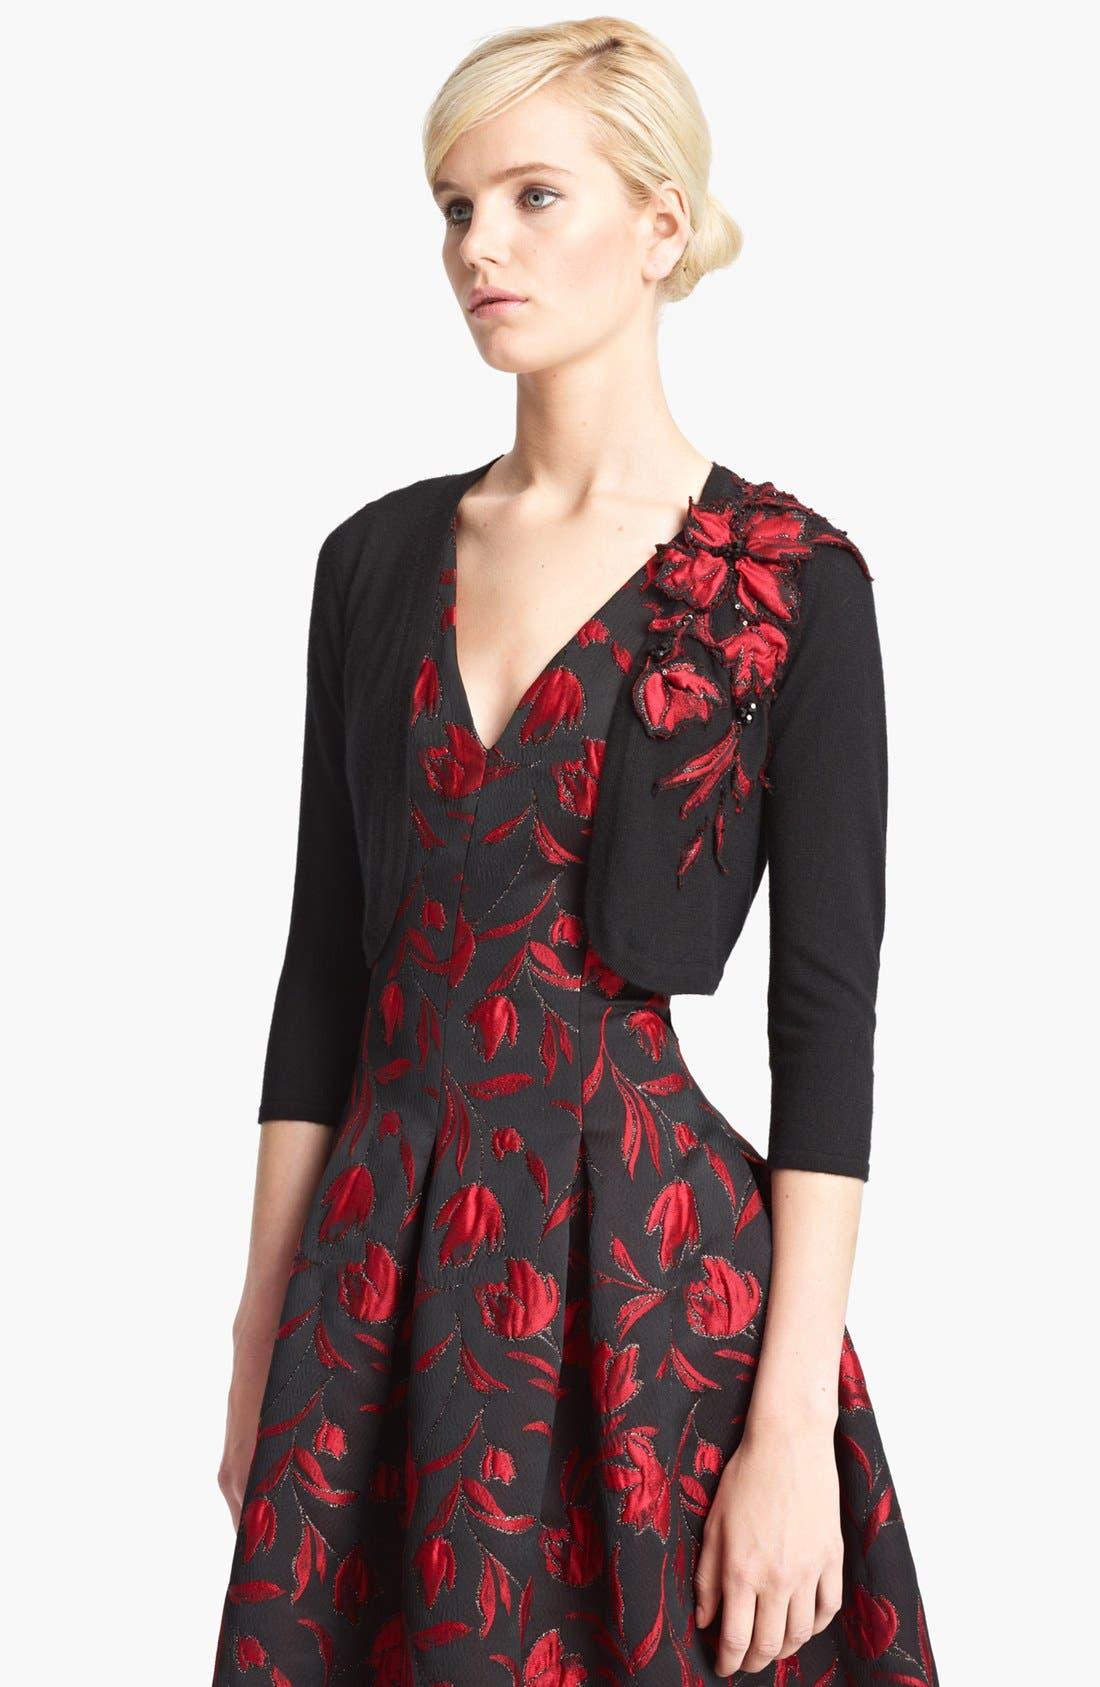 Alternate Image 1 Selected - Oscar de la Renta Floral Embroidered Bolero